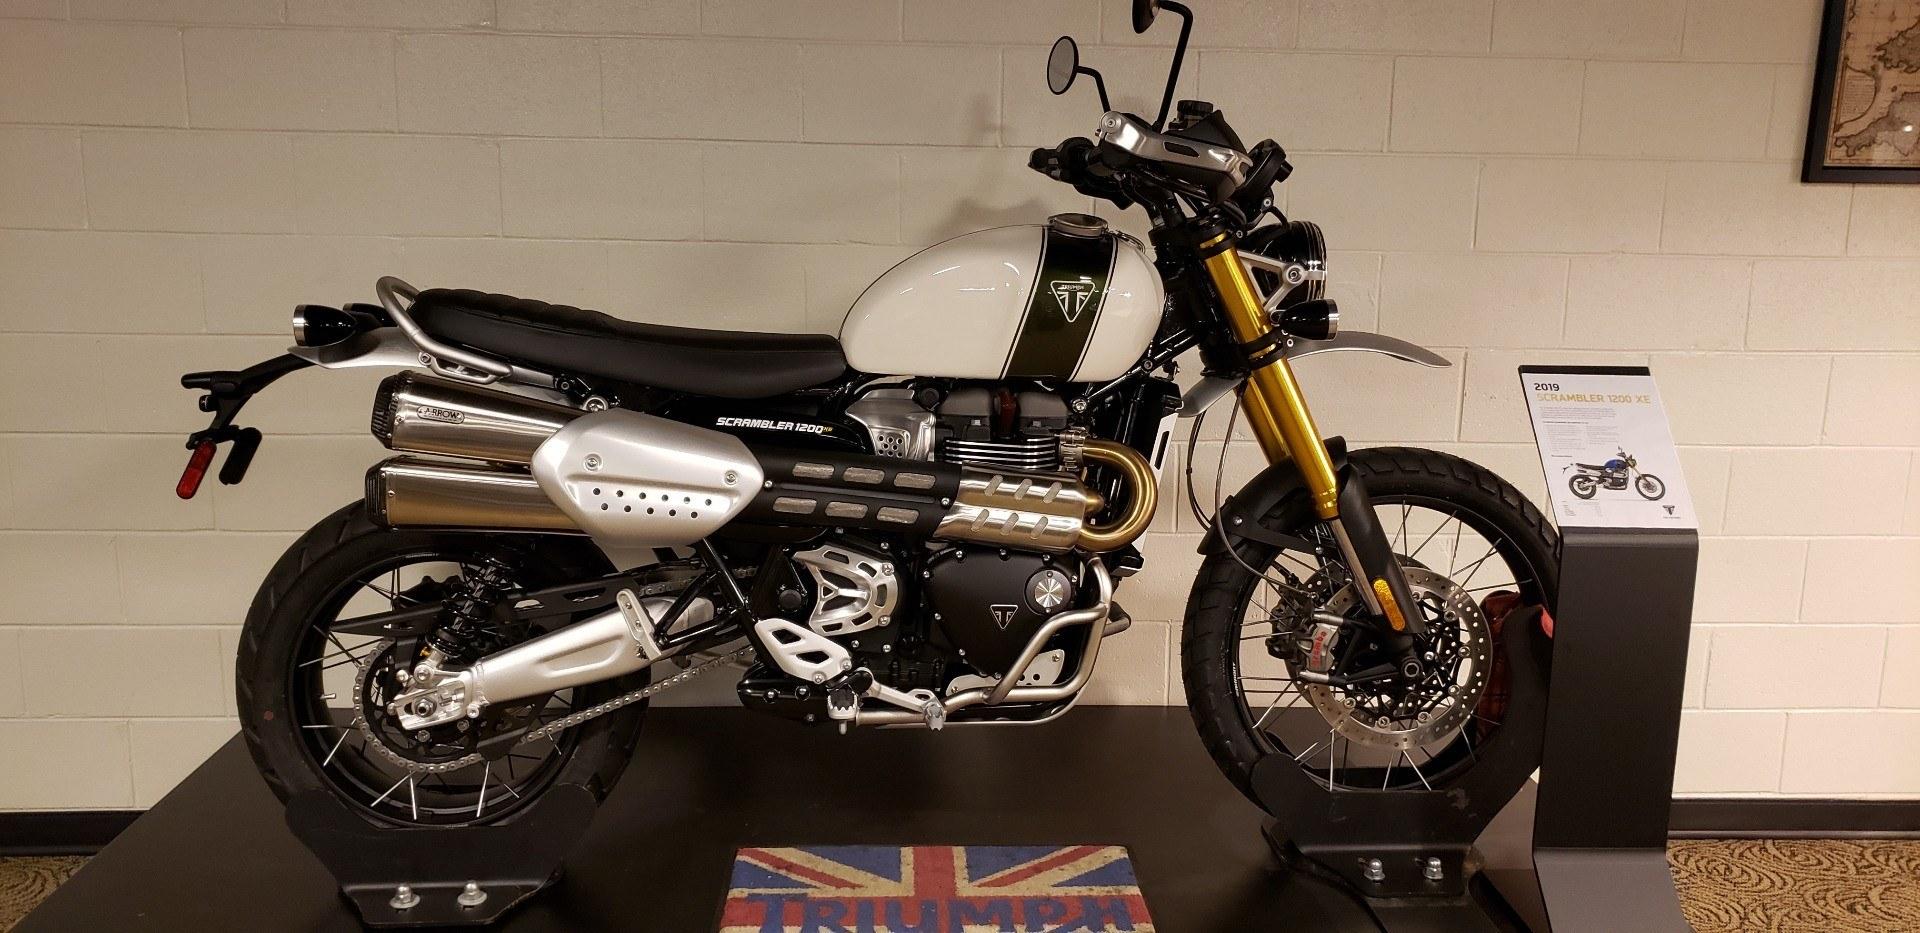 New 2019 Triumph Scrambler 1200 Xe Motorcycles In Shelby Township Mi